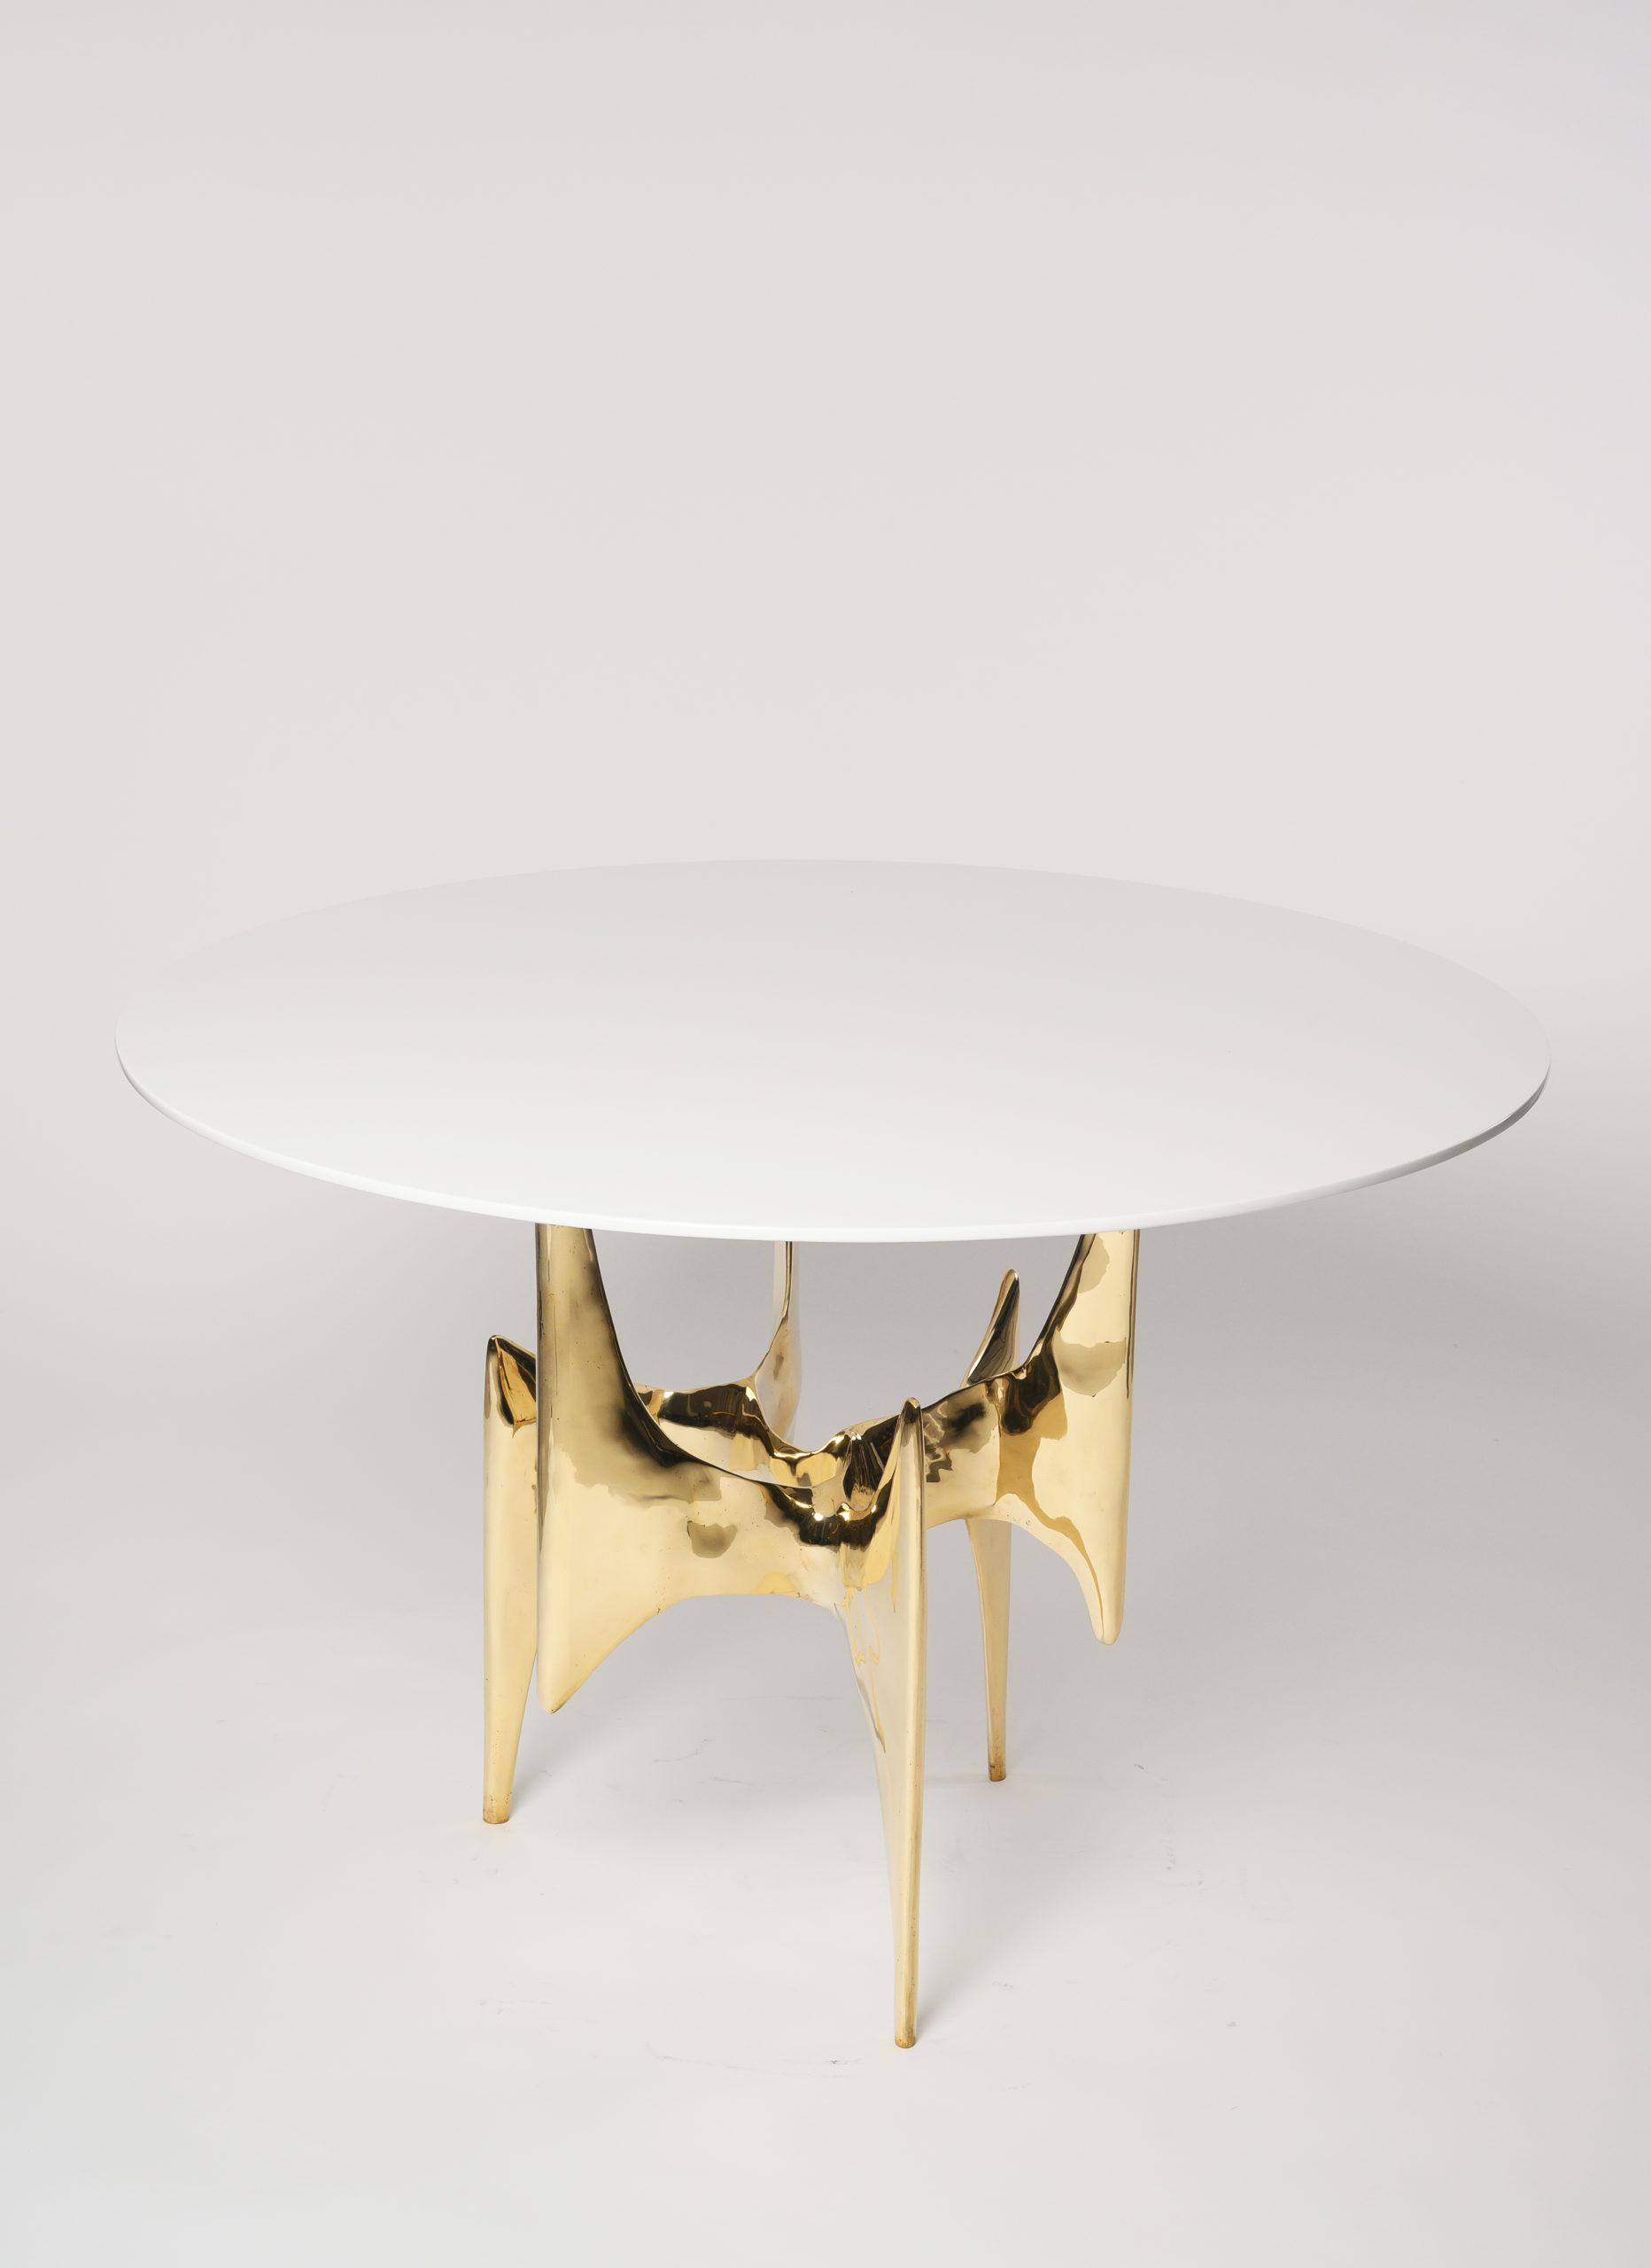 NYDC_WNWN_products_david_sutherland_elan_atelier_ella_table_BEE_5273